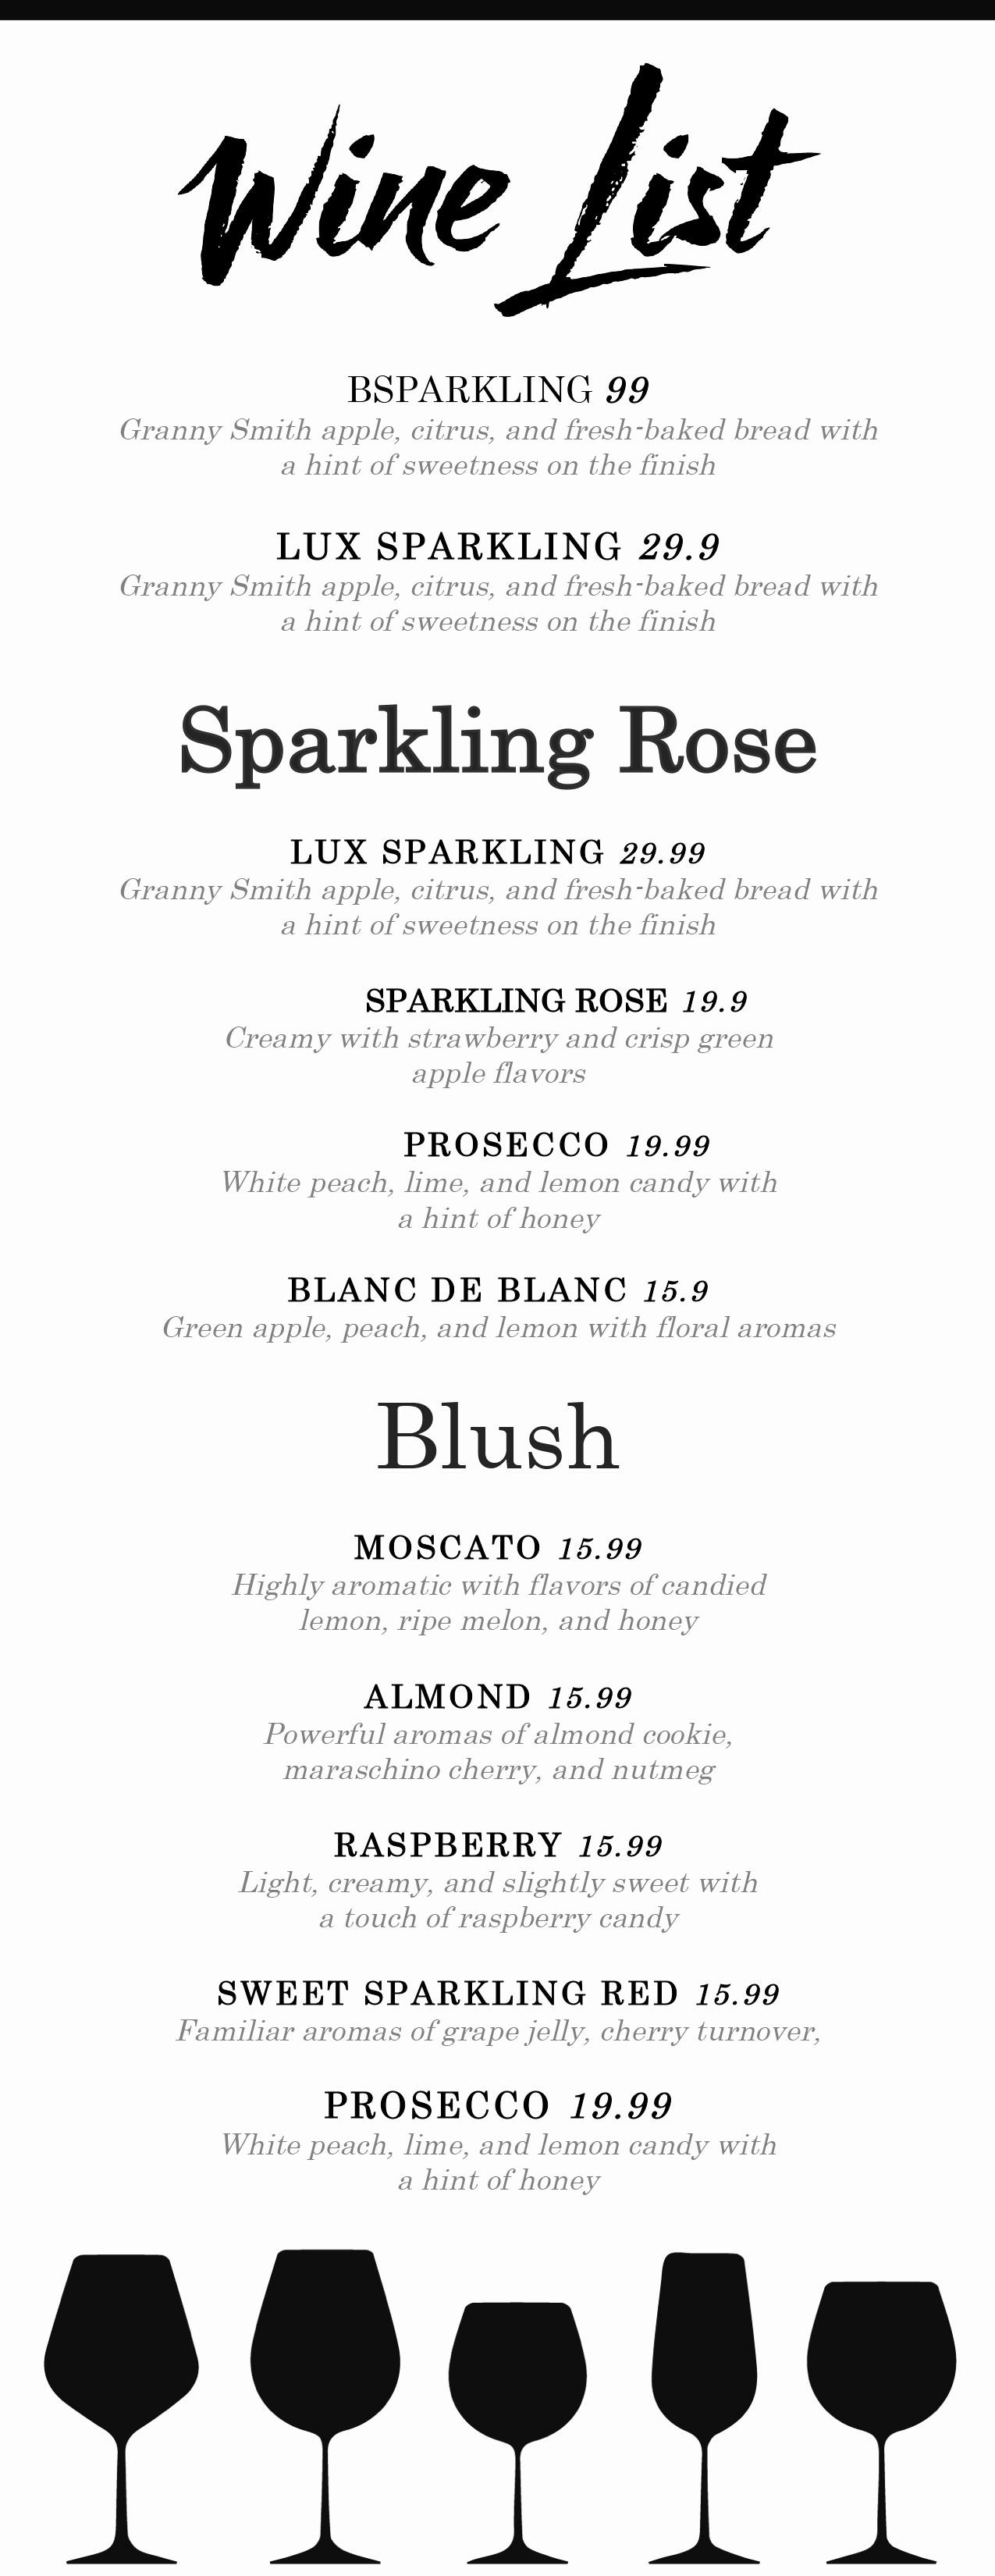 Free Menu Template Microsoft Word Luxury Design & Templates Menu Templates Wedding Menu Food